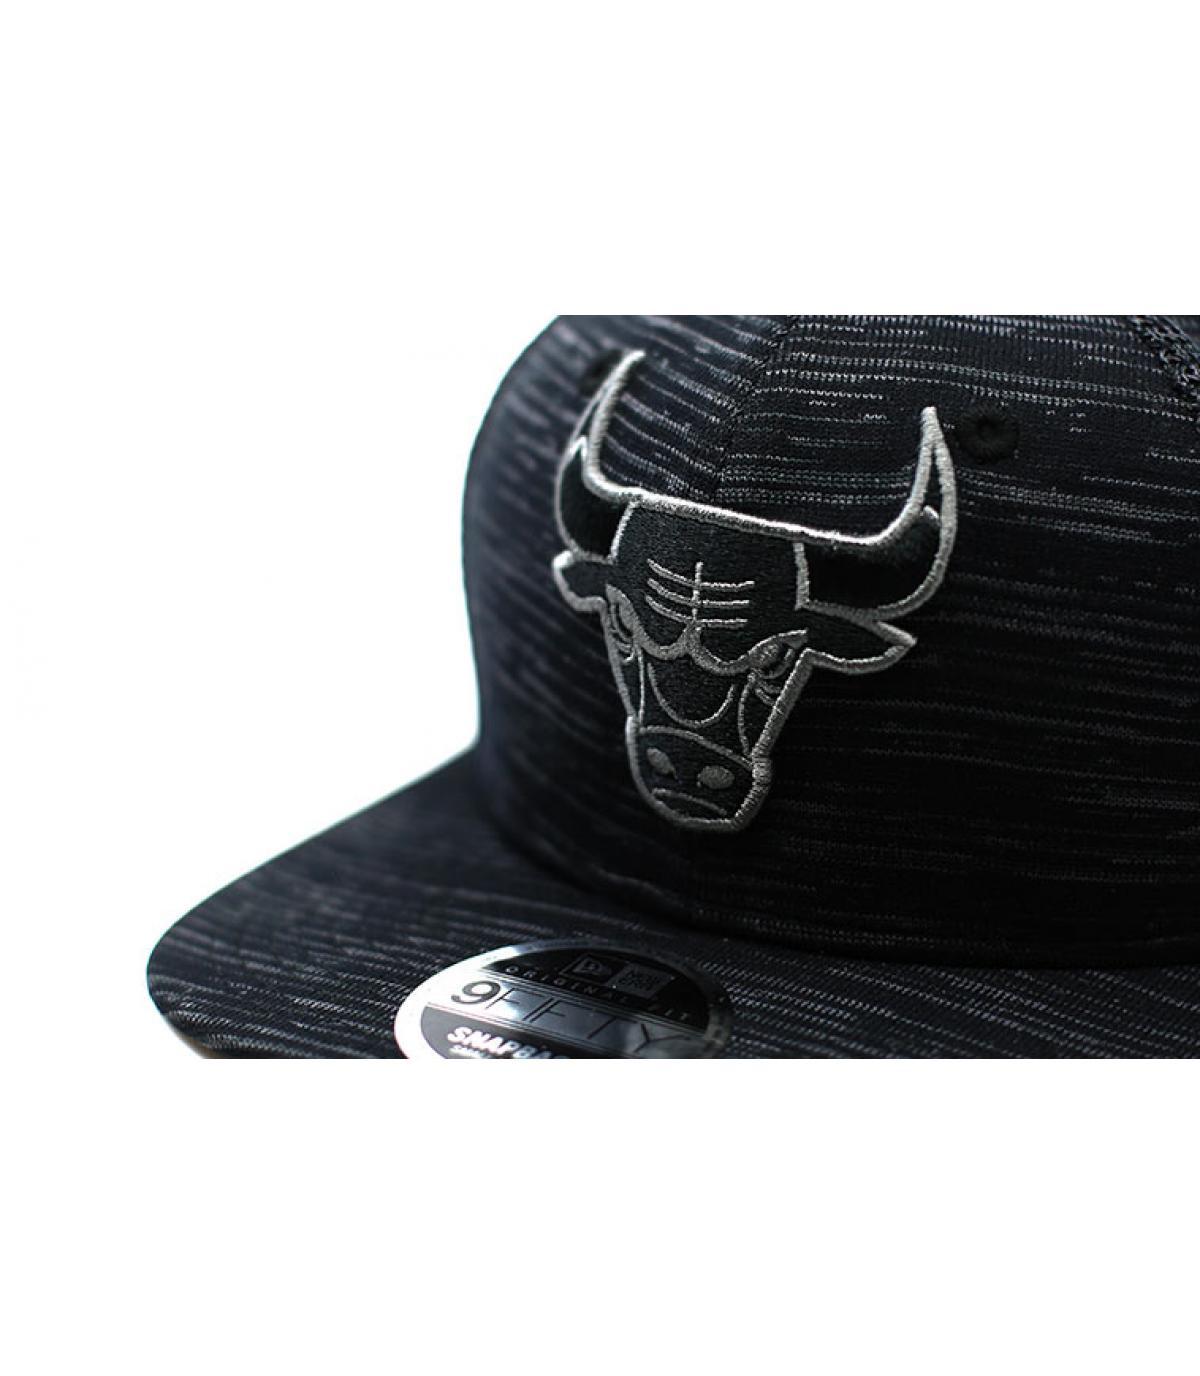 Details Engineered Fit Bulls 9Fifty black - afbeeling 3